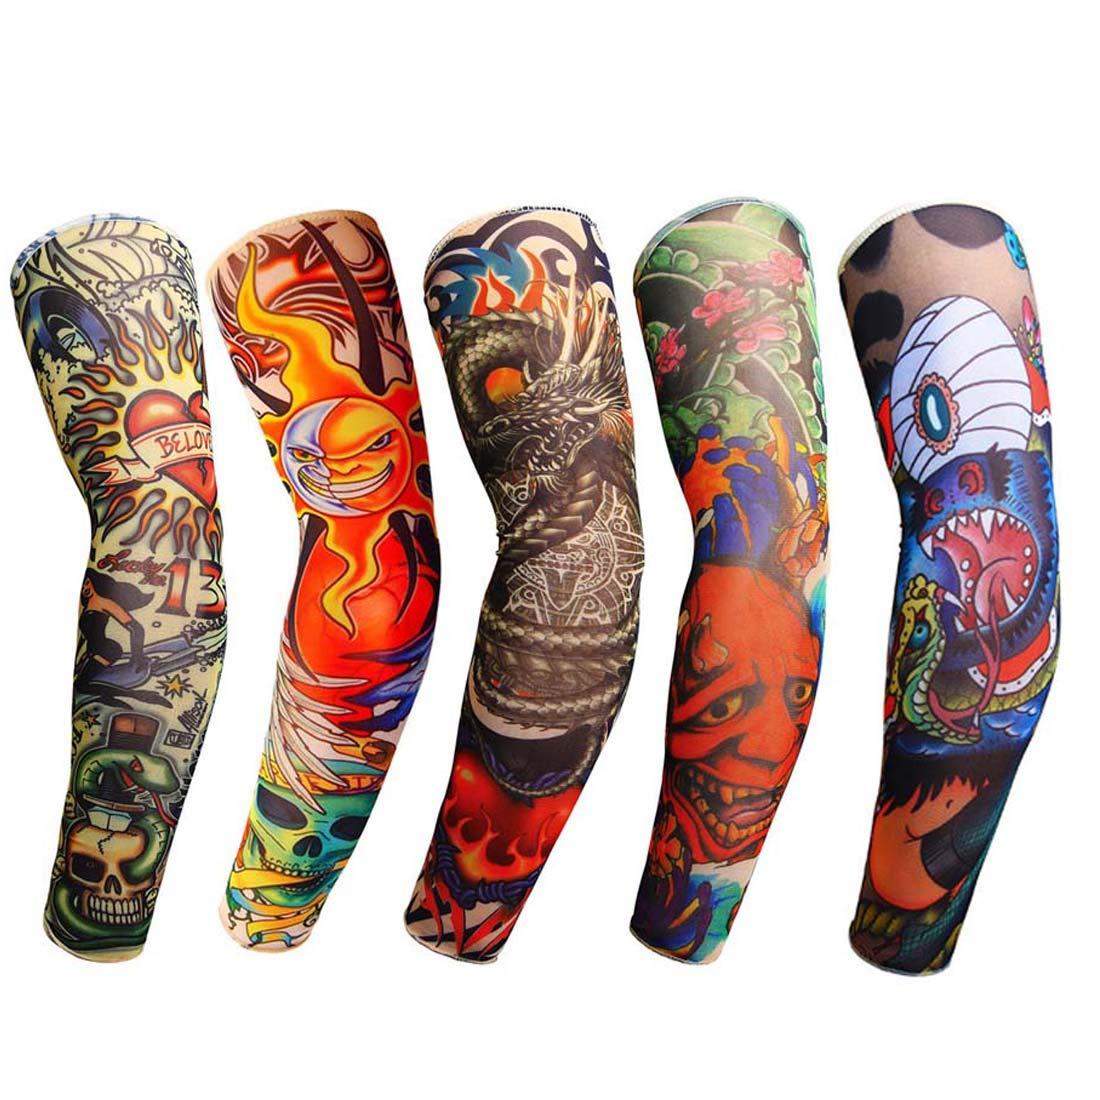 Amazon.com : Tattoo Arm Sleeves 6PCS Fake Temporary Arm Tattoo Cover ...